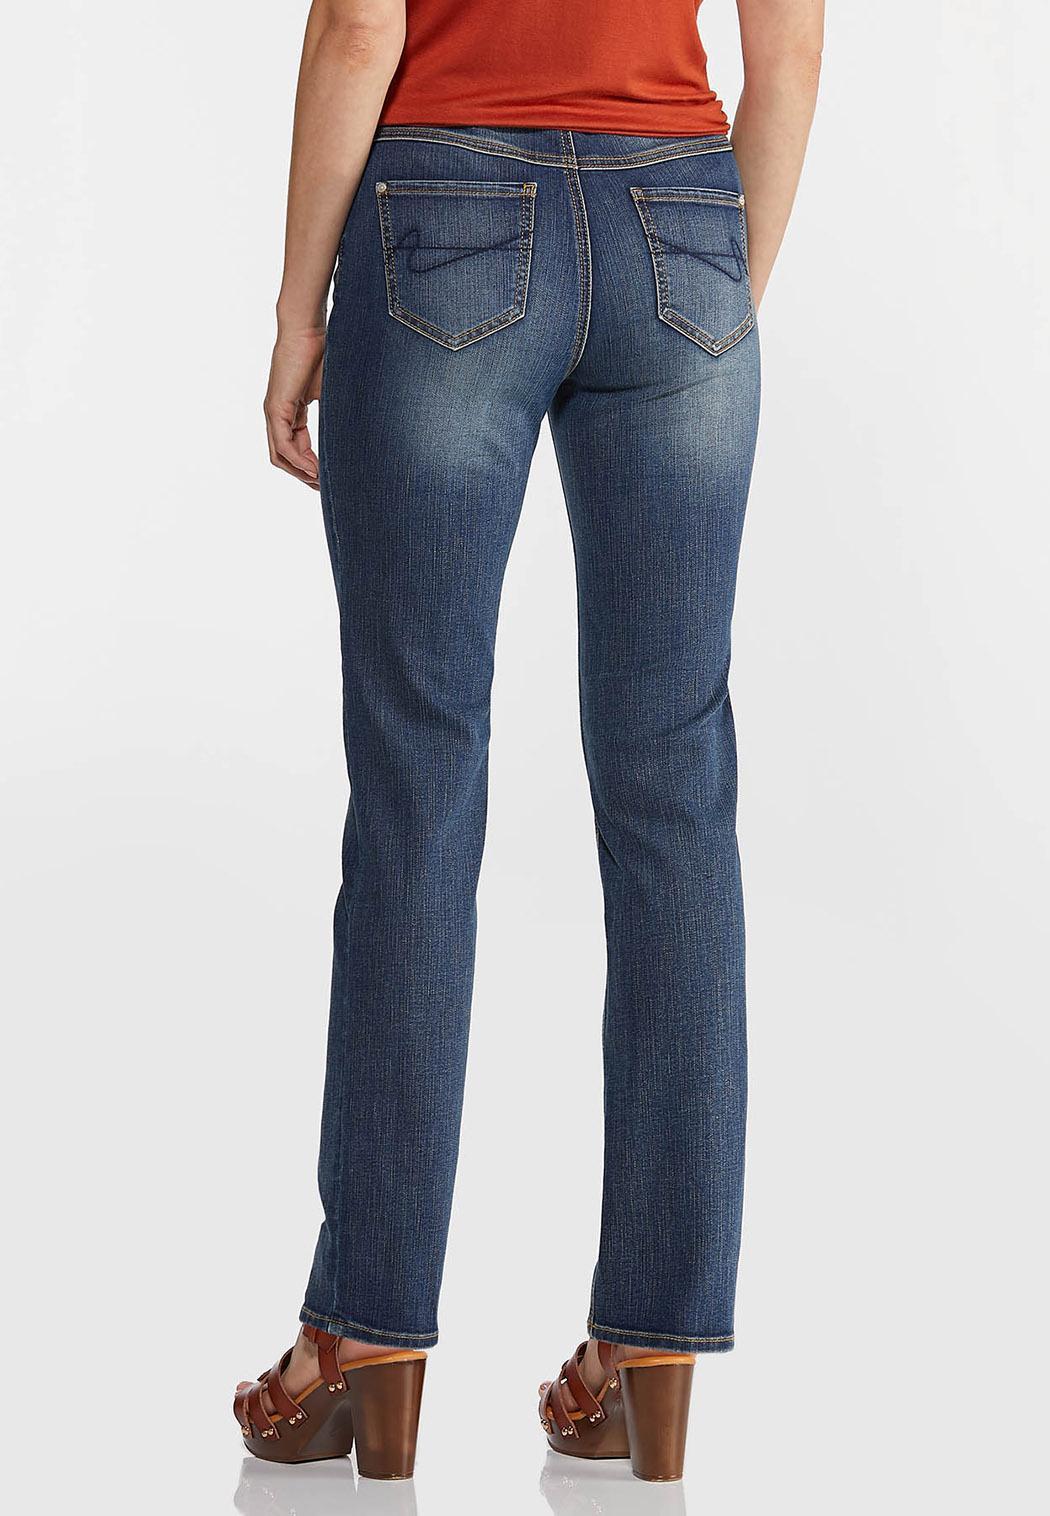 Petite Straight High-Rise Jeans (Item #44350186)